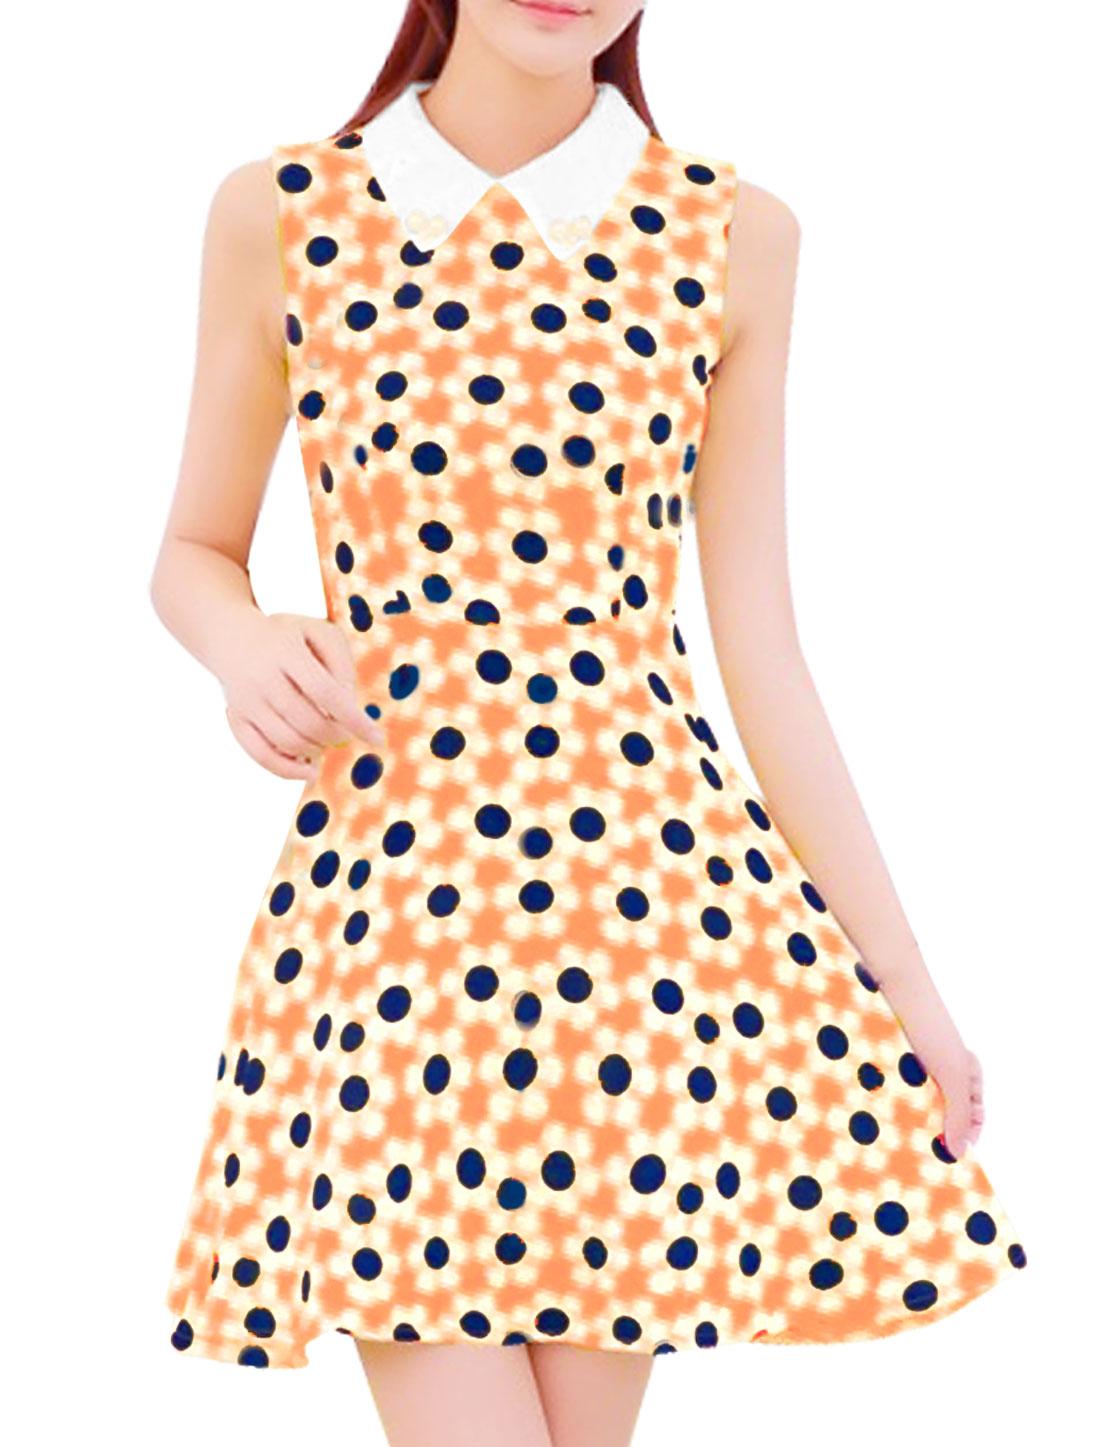 Women Sleeveless Concealed Zipper Back Flower Pattern Dress Orange S